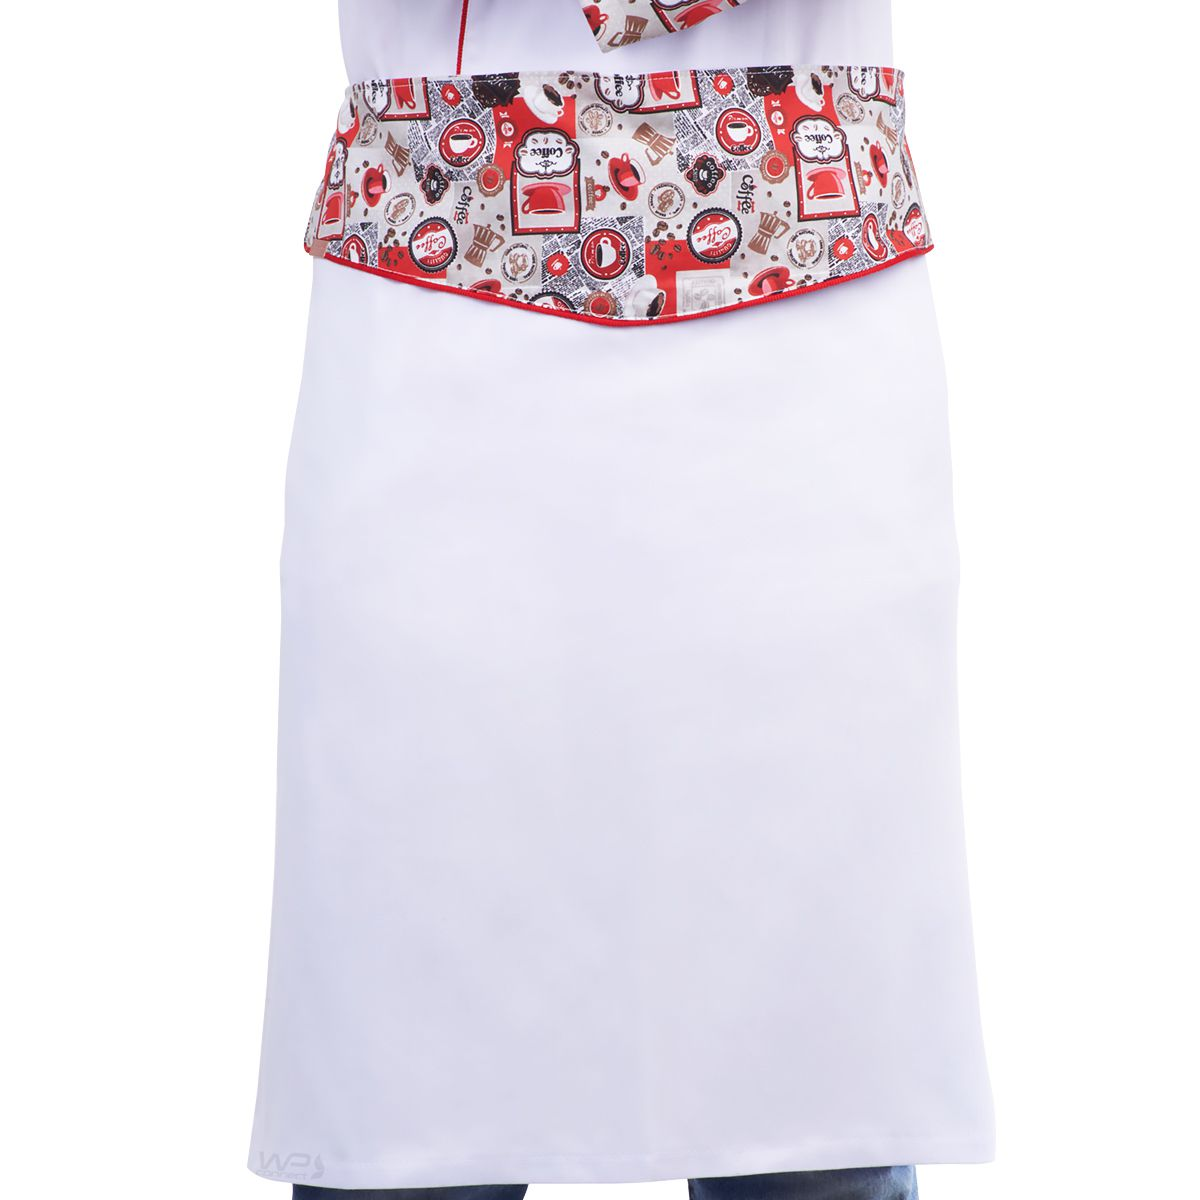 Avental de Cintura Chef Cafeteria Estampa Café